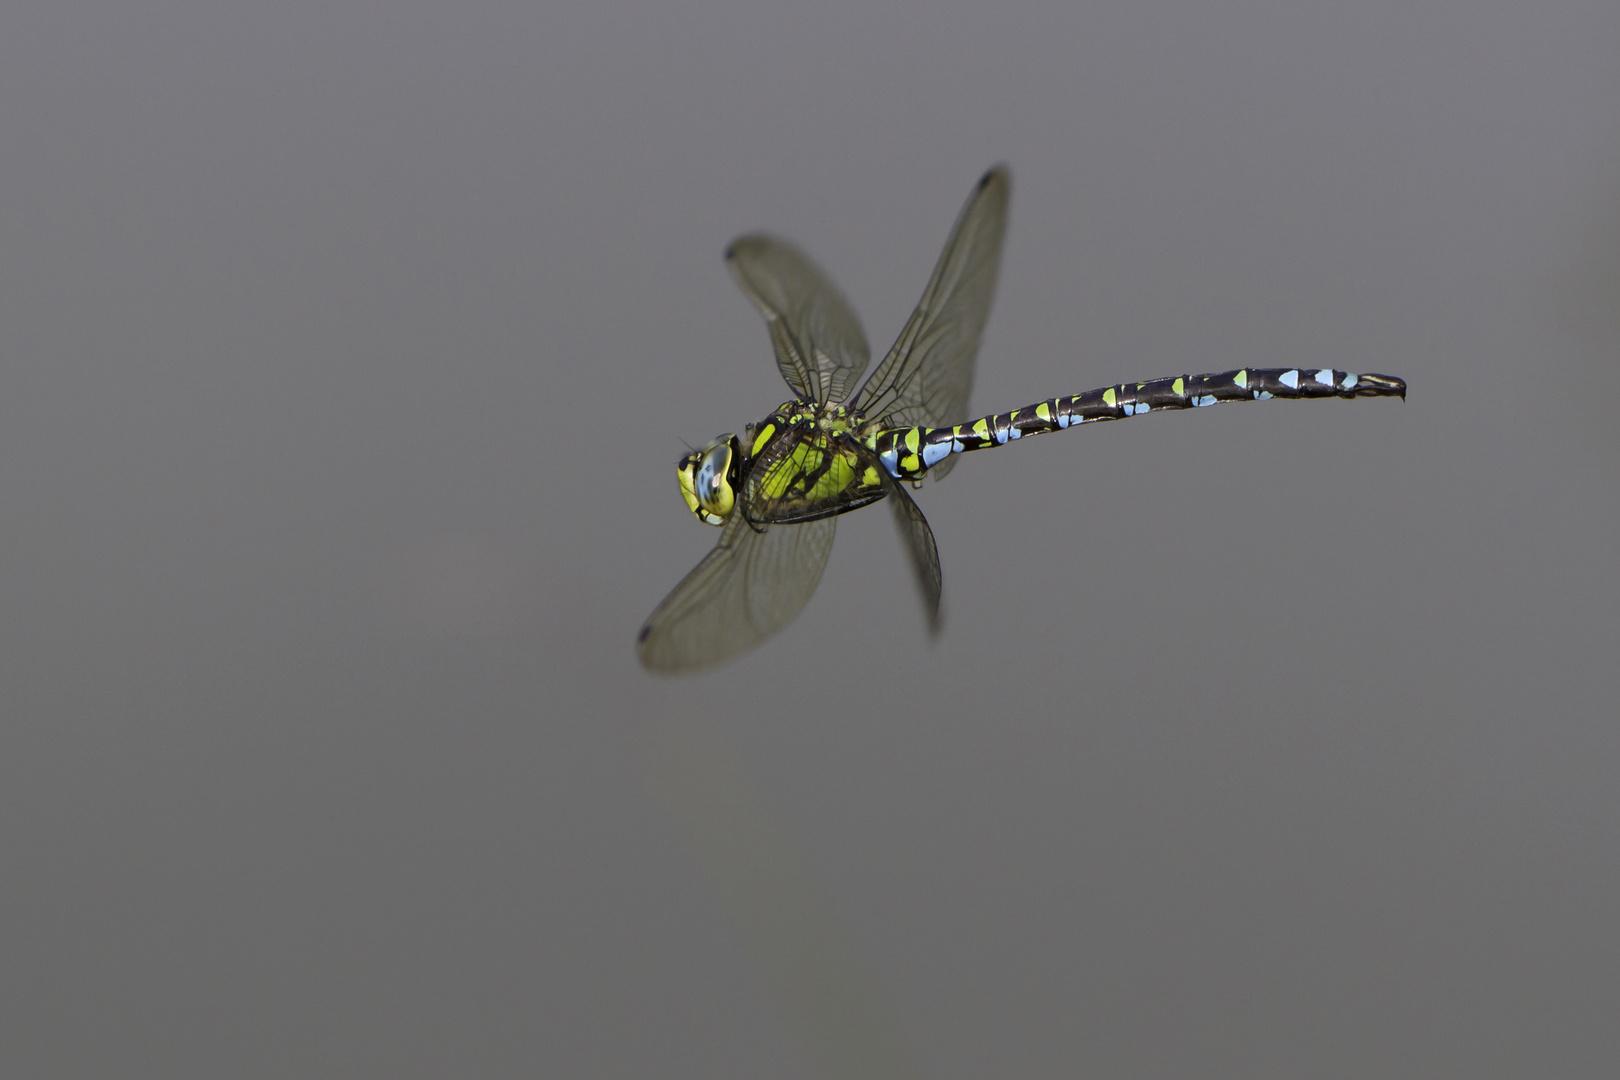 Flyby Blaugrüne Mosaikjungfer (Aeshna cyanea)